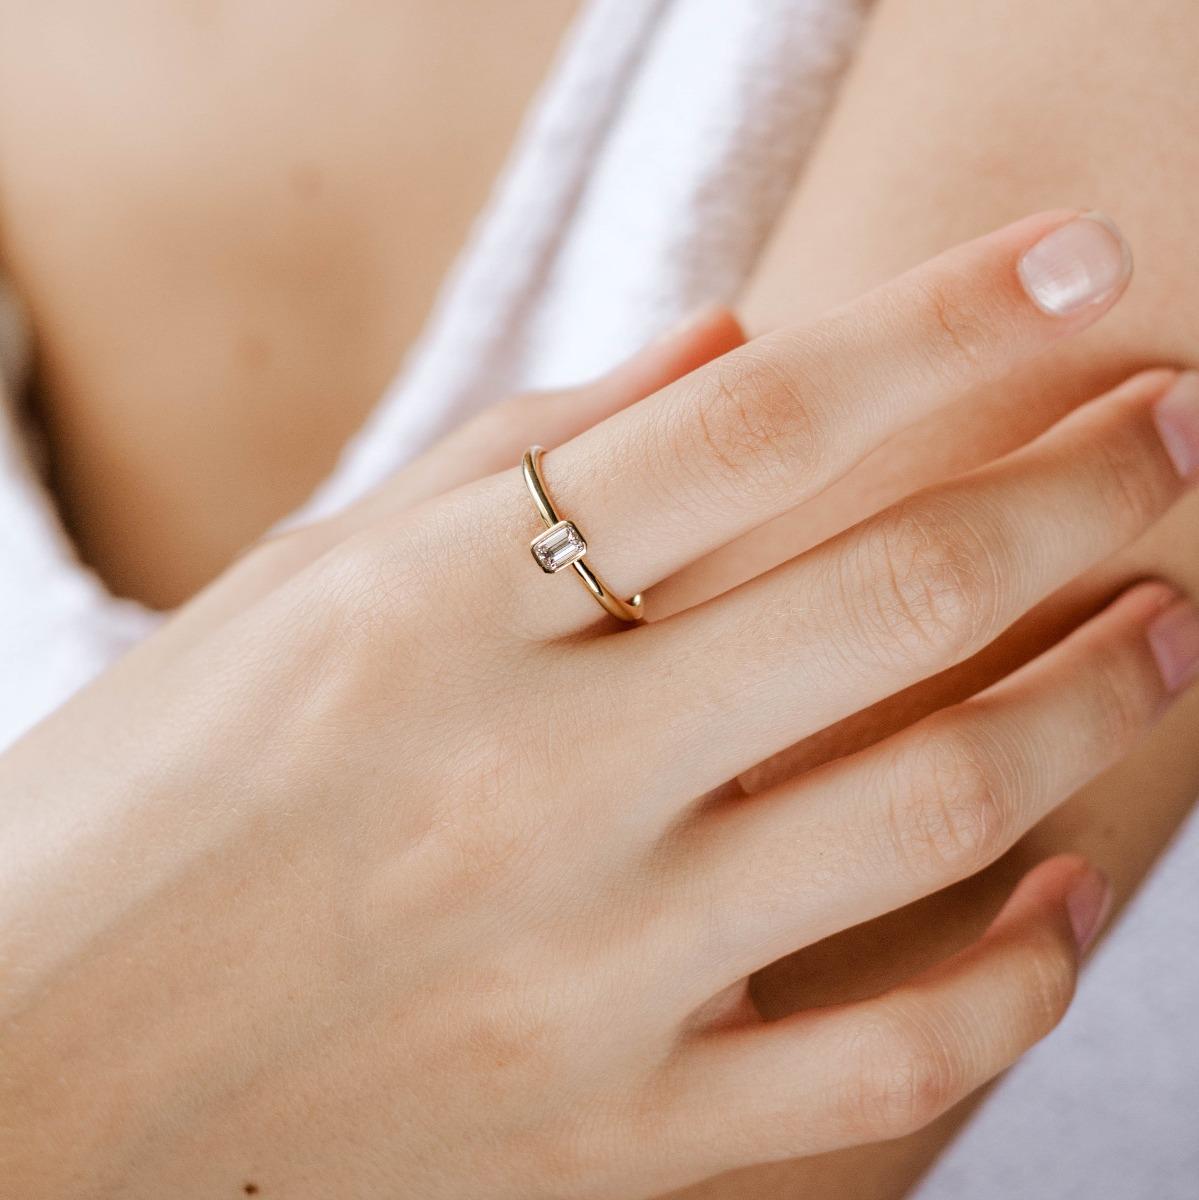 Solitaire Diamond Unique Ring 14K